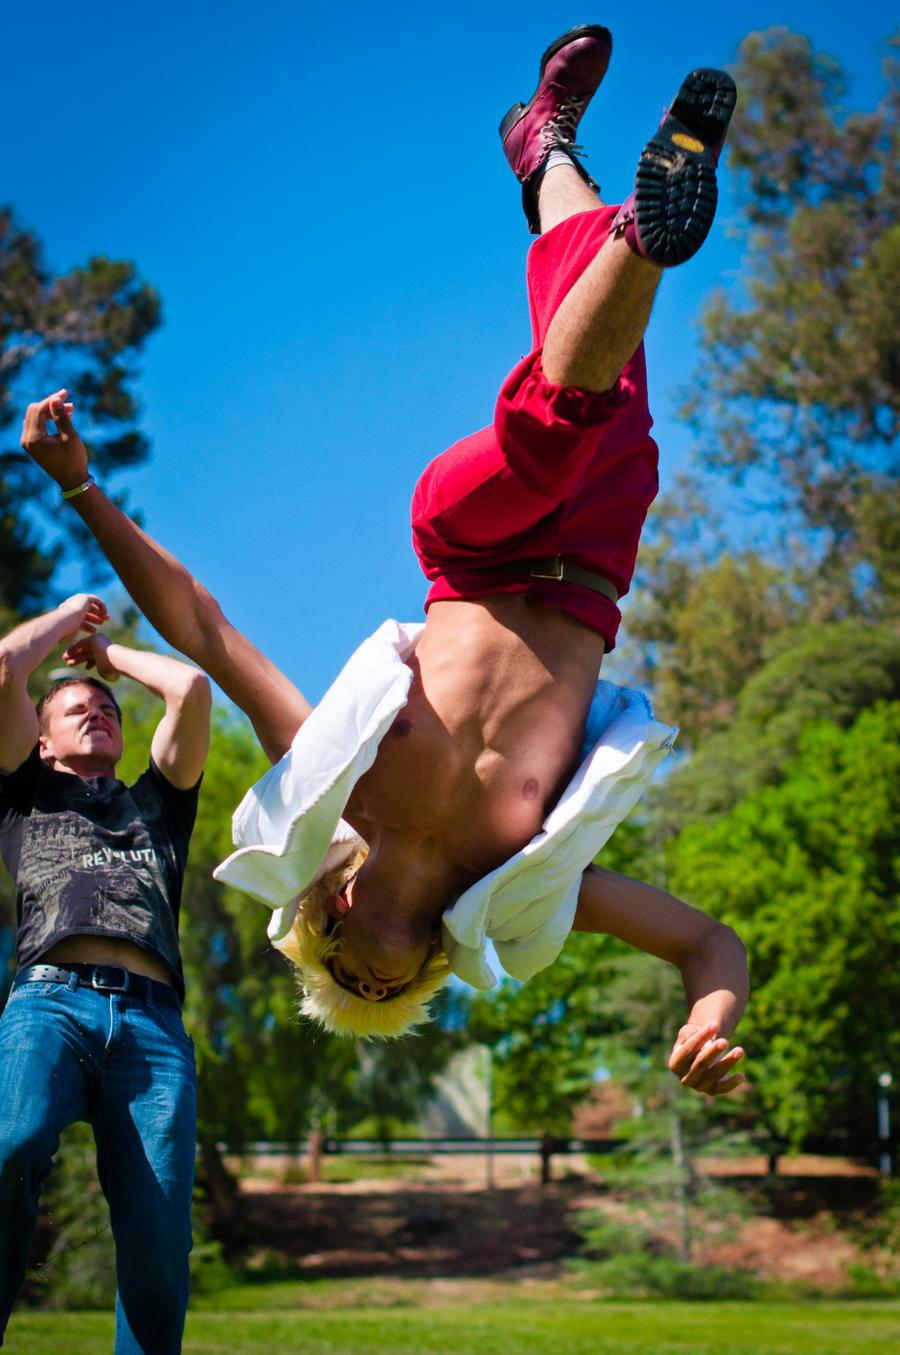 Flash kick by DynamiteBreakdown